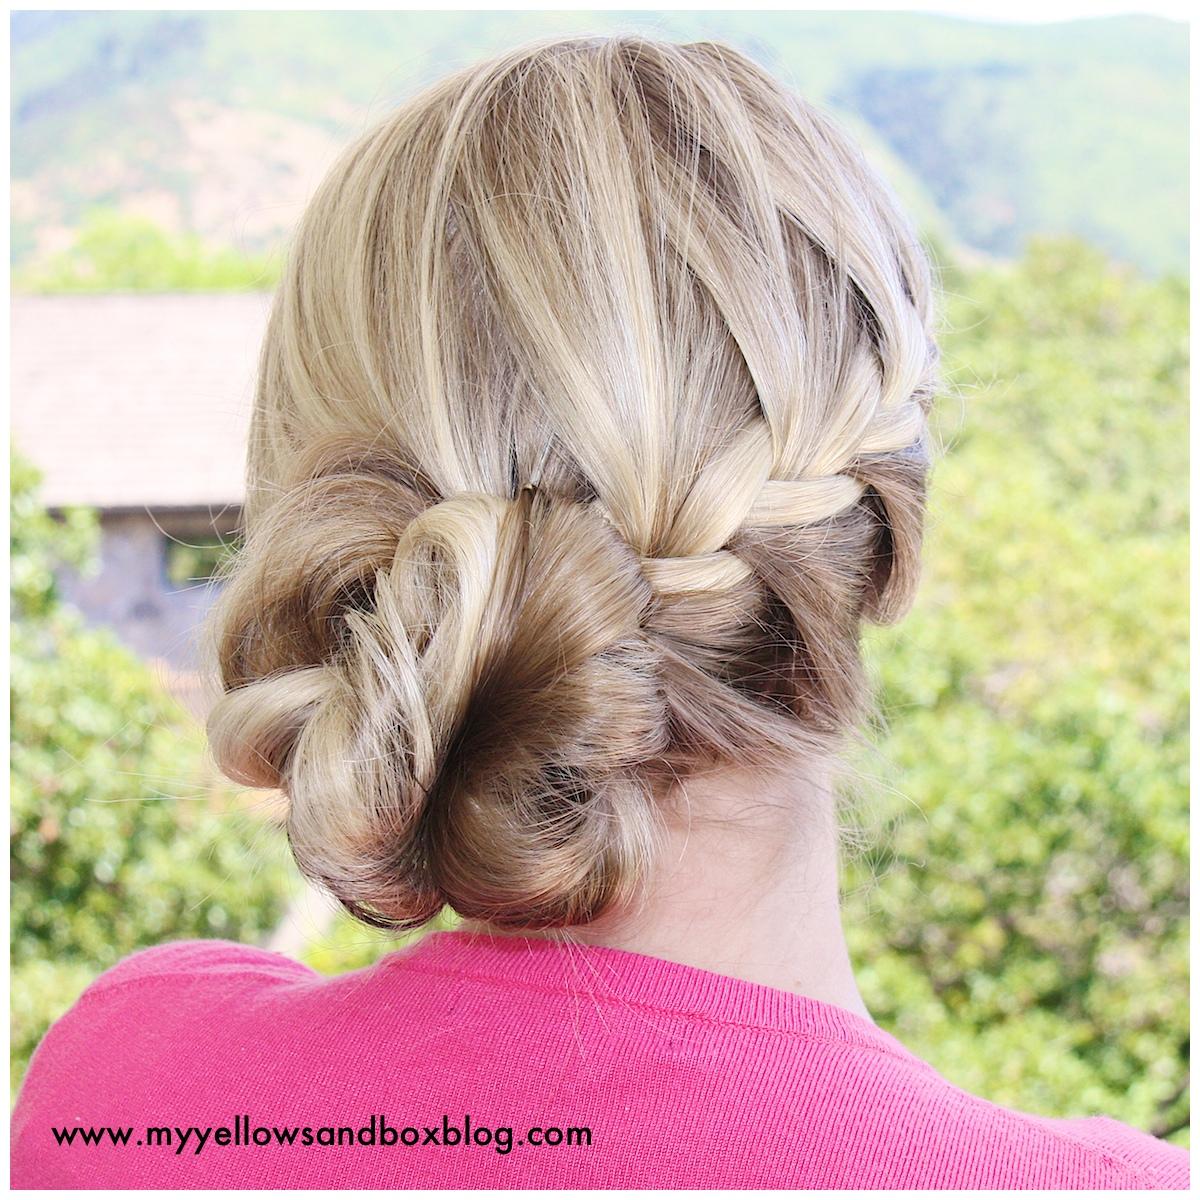 Tremendous Hairstyles To Do With Wet Hair Short Hairstyles Gunalazisus